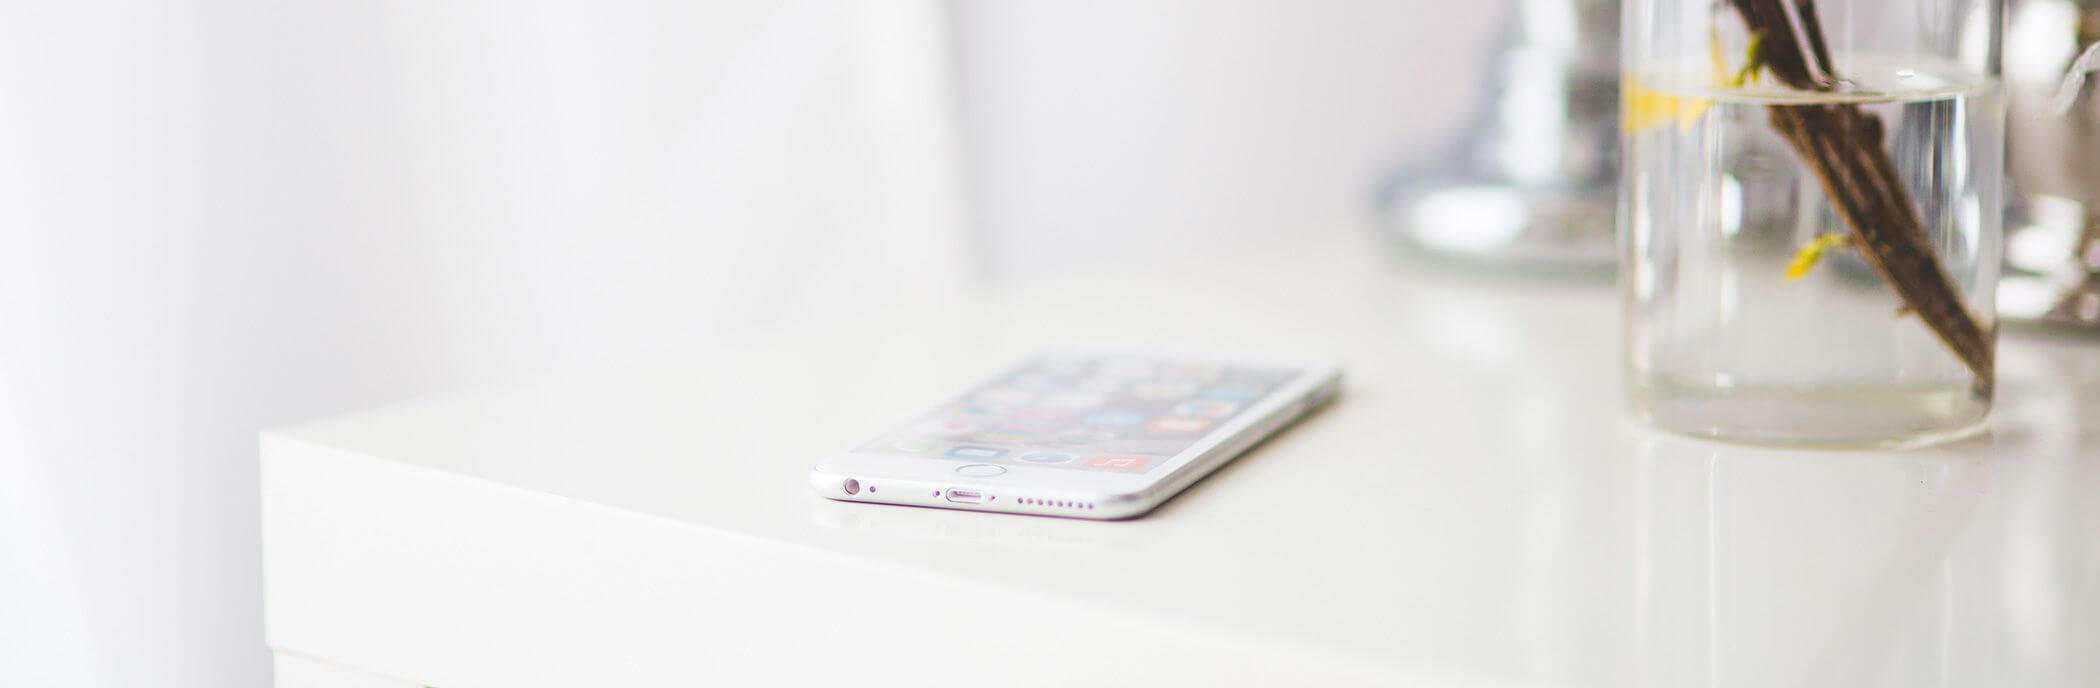 iphone-791450